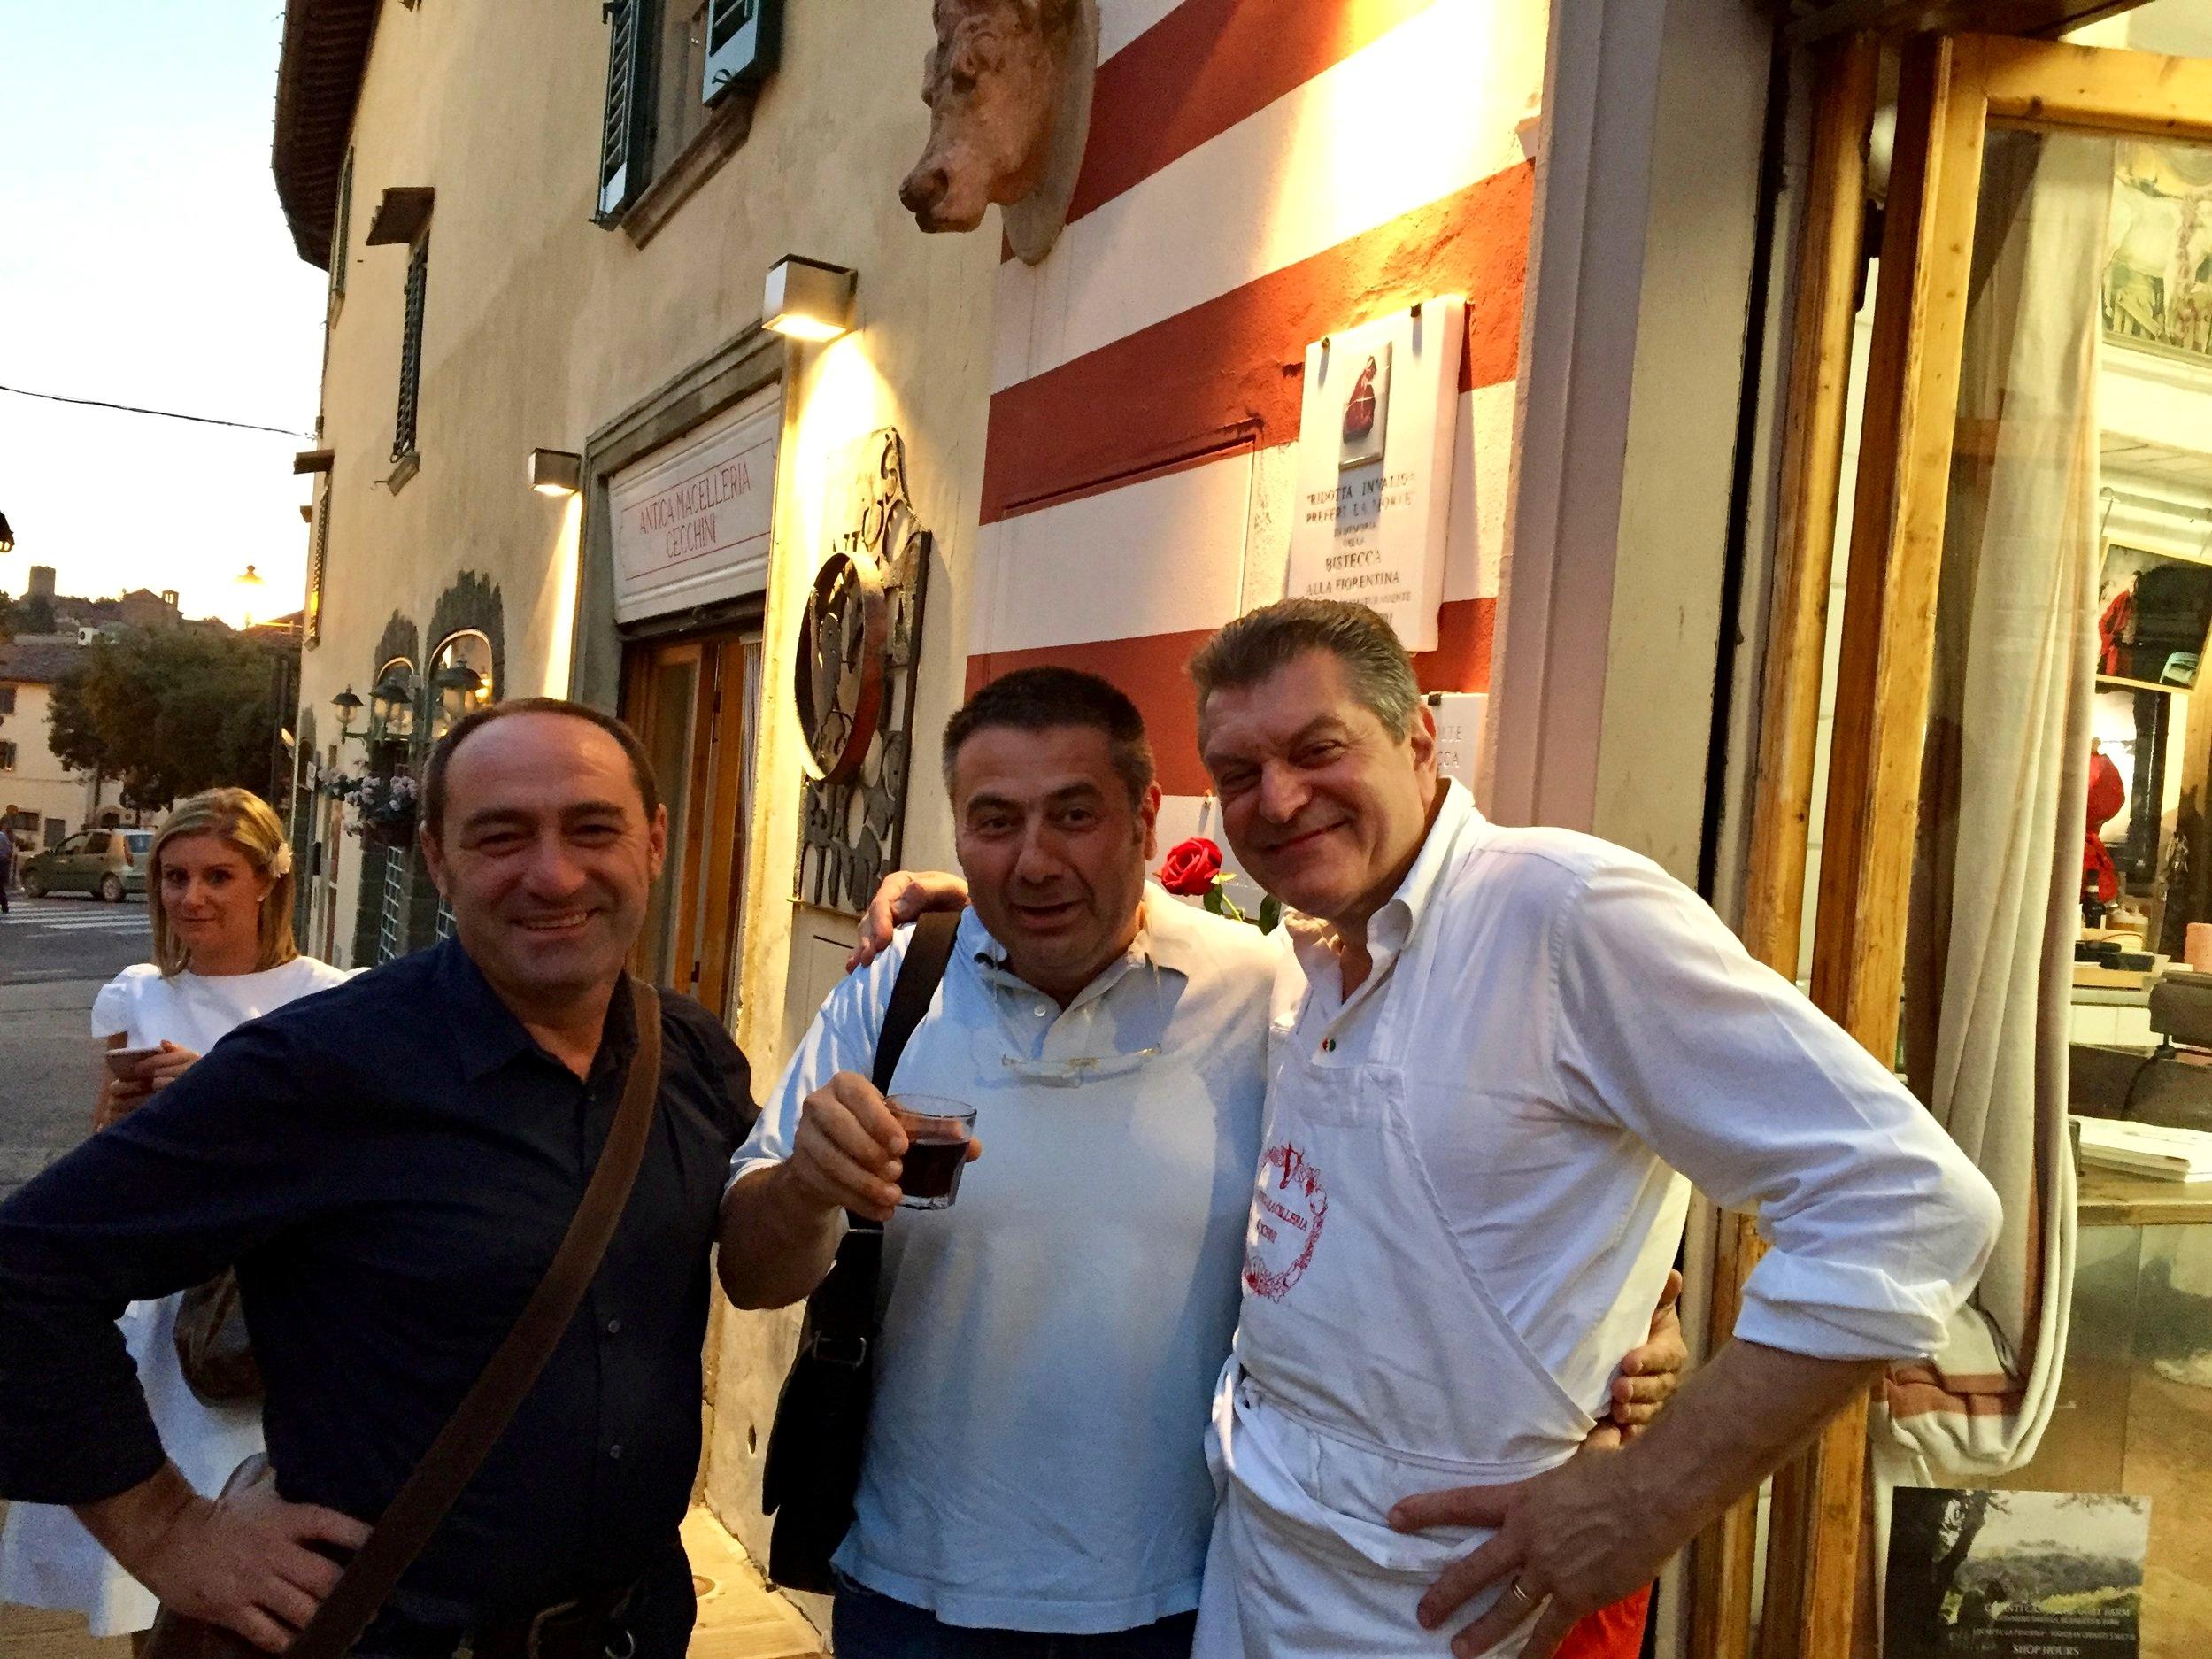 Meet the butchers - Cecchini, Fracassi, Sabatino